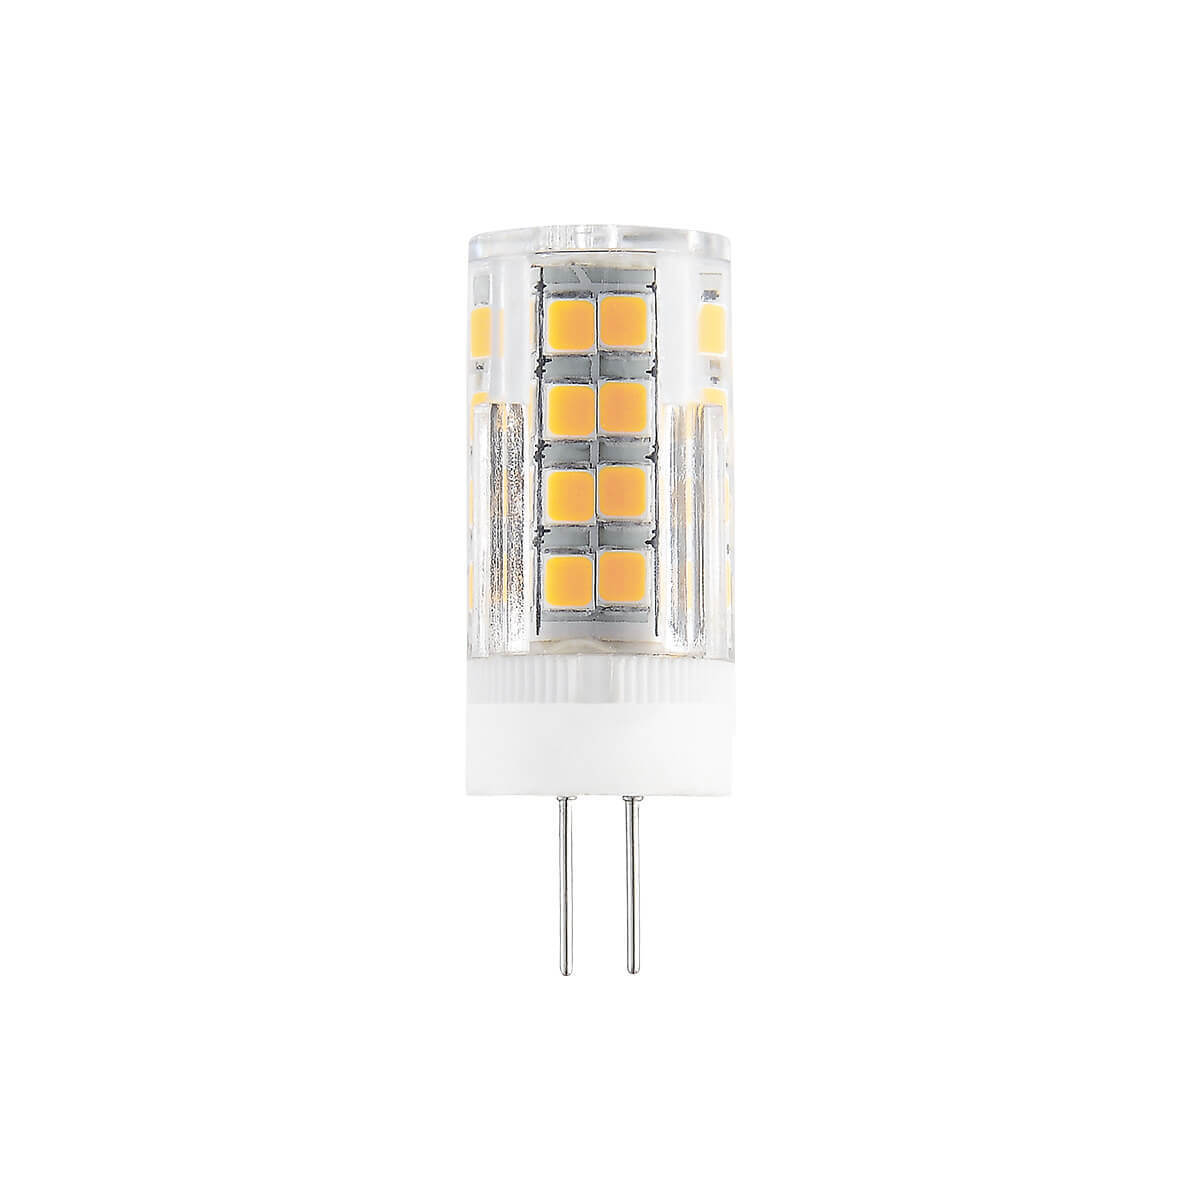 купить Лампа светодиодная Elektrostandard G4 7W 4200K прозрачная 4690389112973 по цене 192 рублей